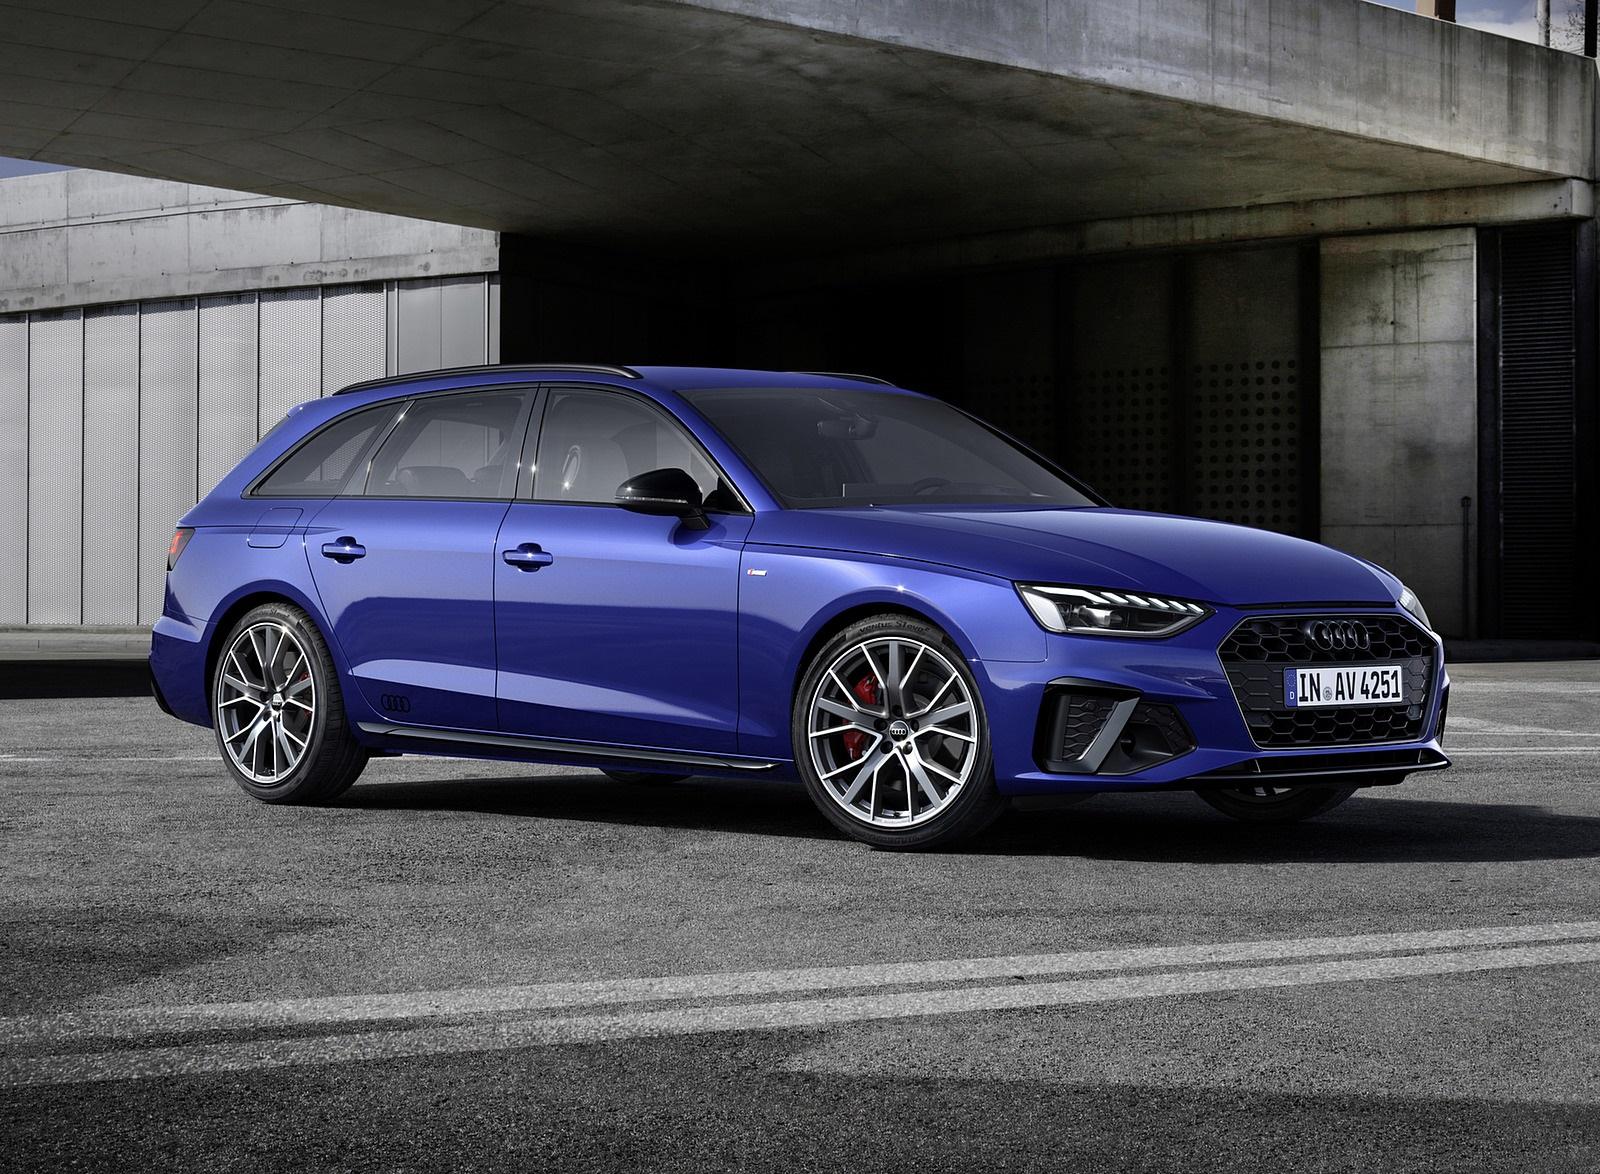 2022 Audi A4 Avant S Line Competition Plus (Color: Navarra Blue Metallic) Front Three-Quarter Wallpapers (7)